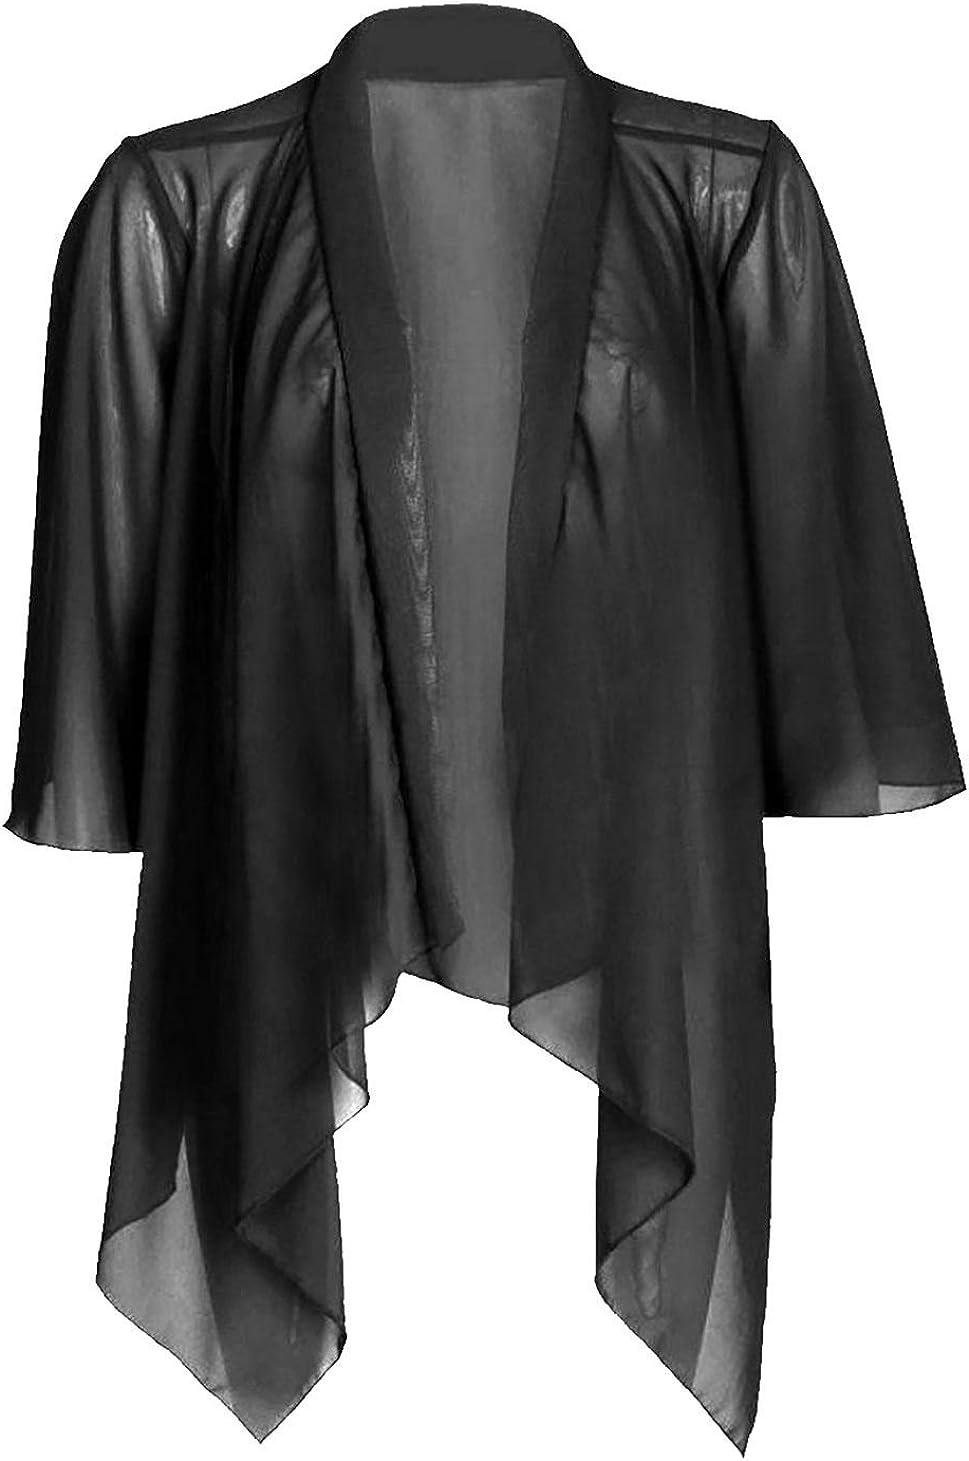 Rimi Hanger Womens Plain Mesh Chiffon Waterfall Cardigan Ladies Sleeve Kimono Shrug Top S/XXXL